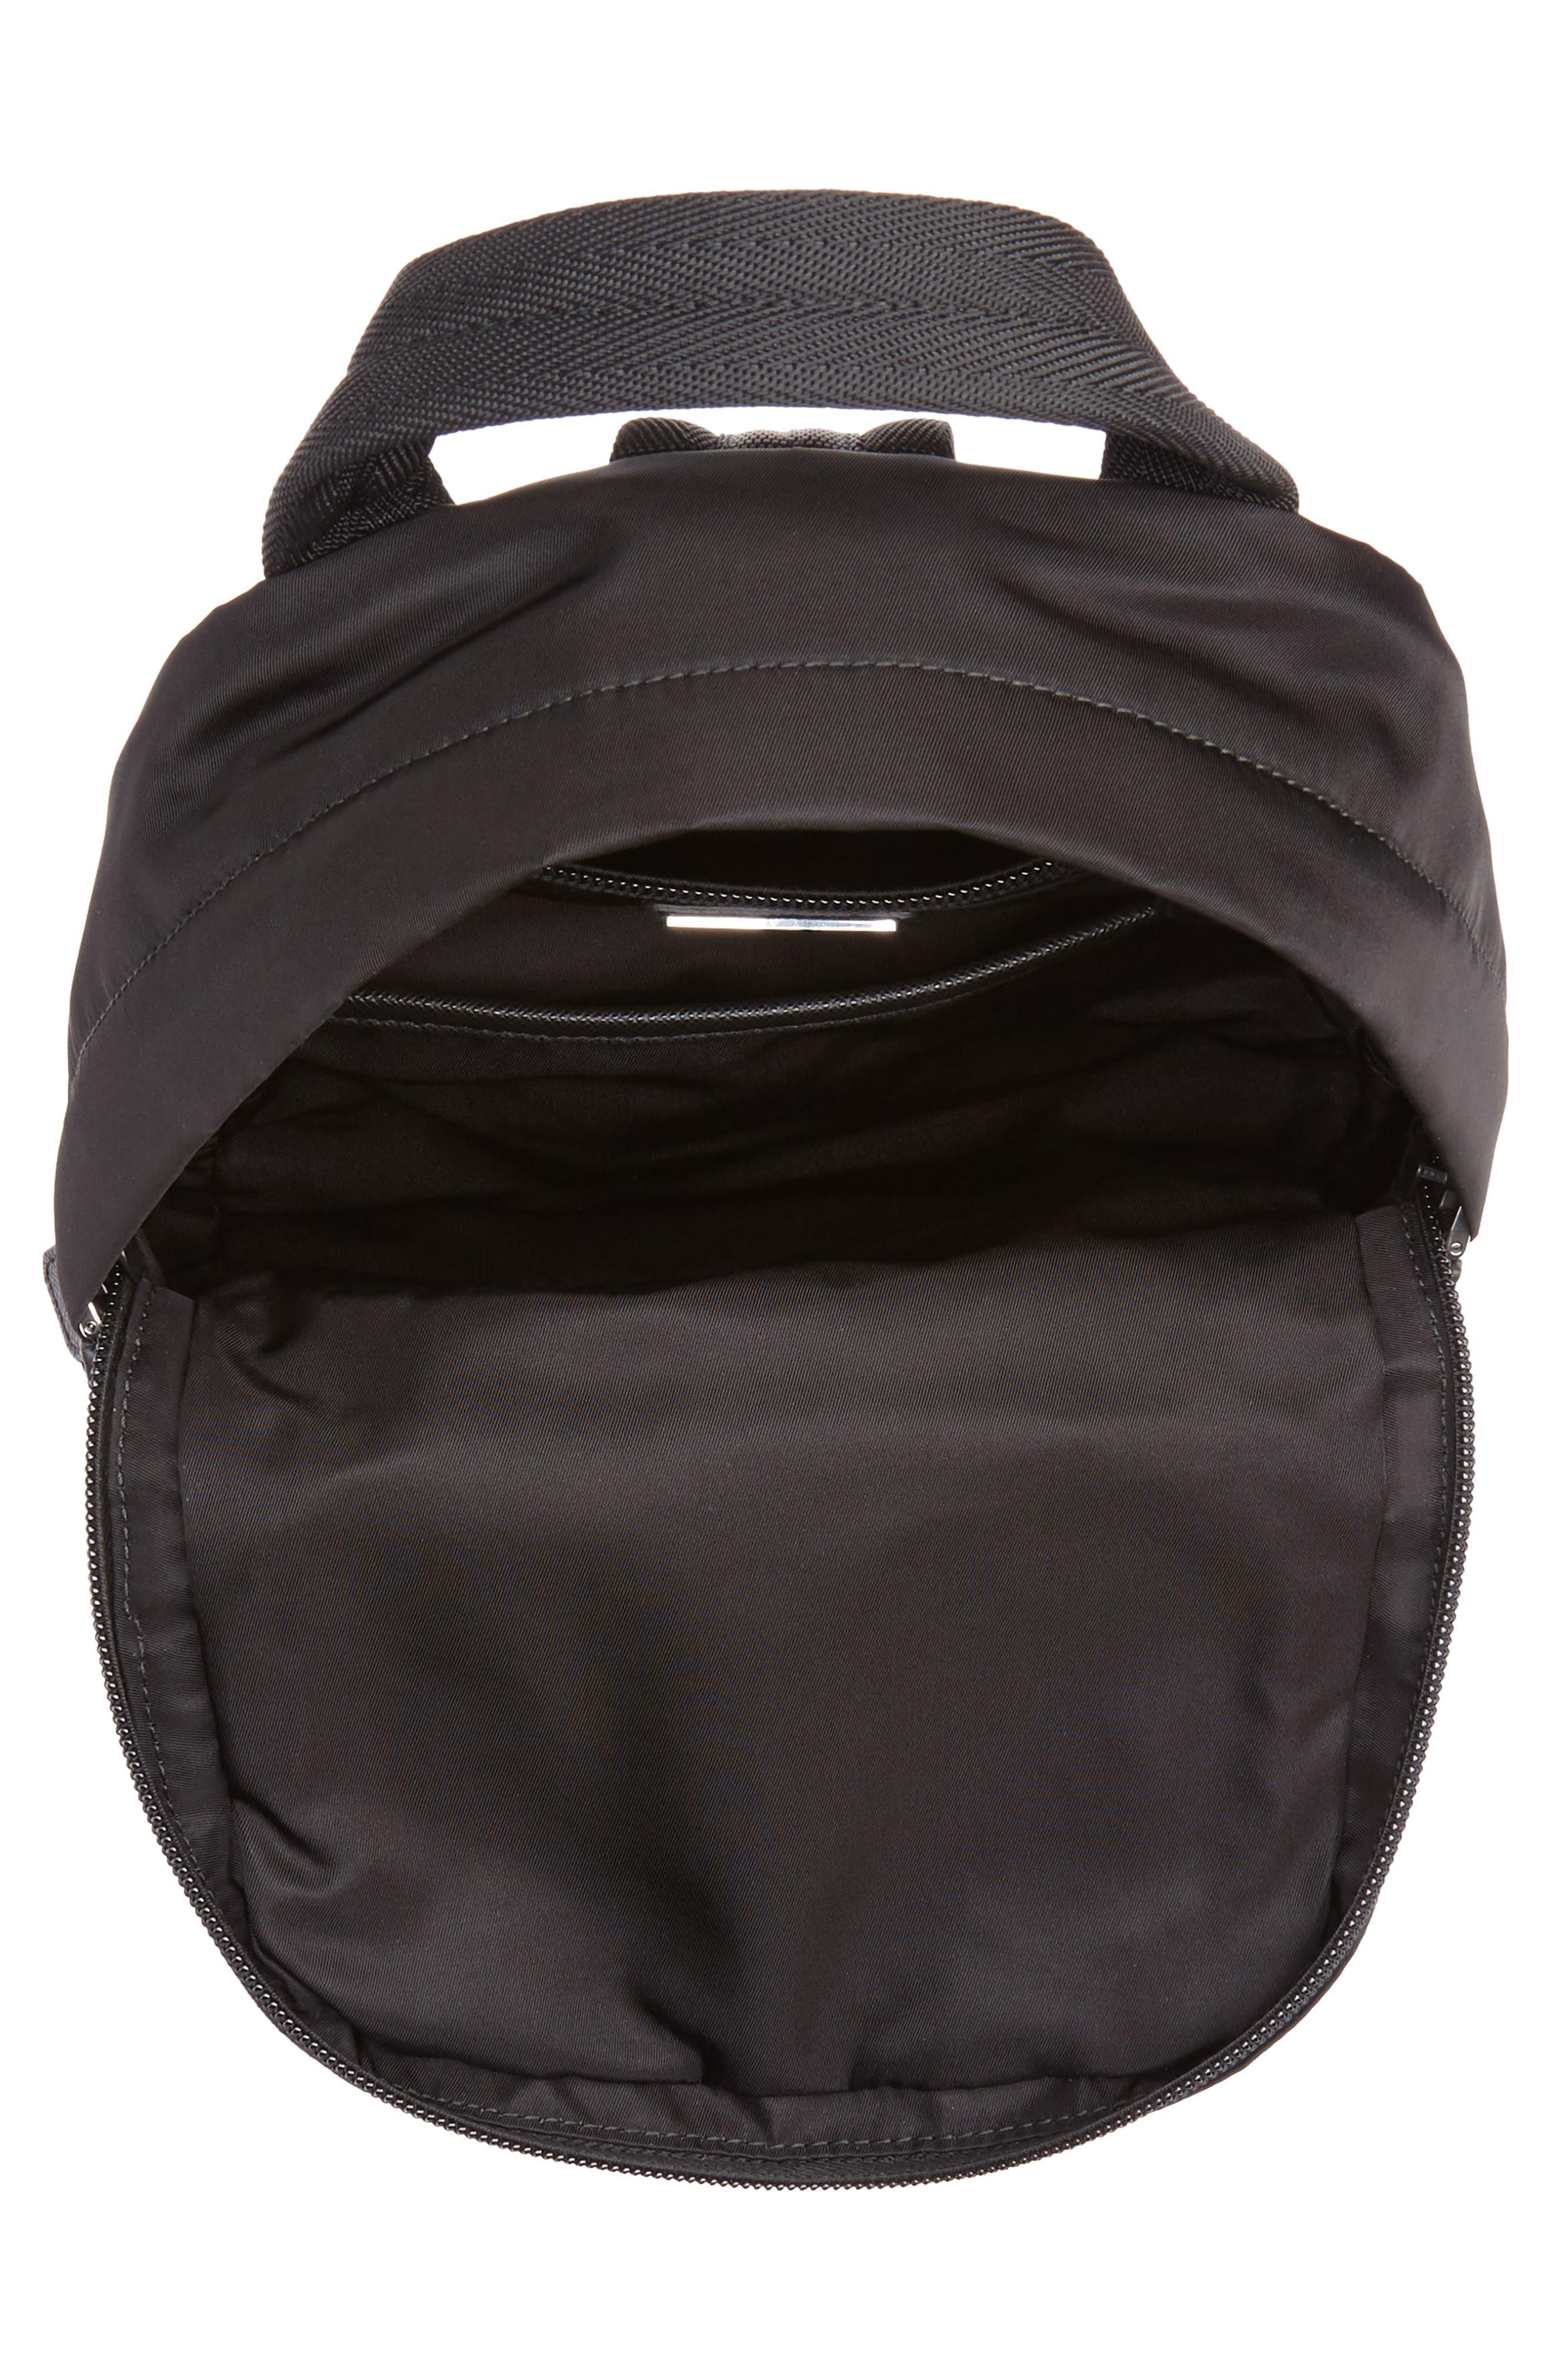 PRADA,                             Tessuto Small Sling Bag,                             Alternate thumbnail 4, color,                             001